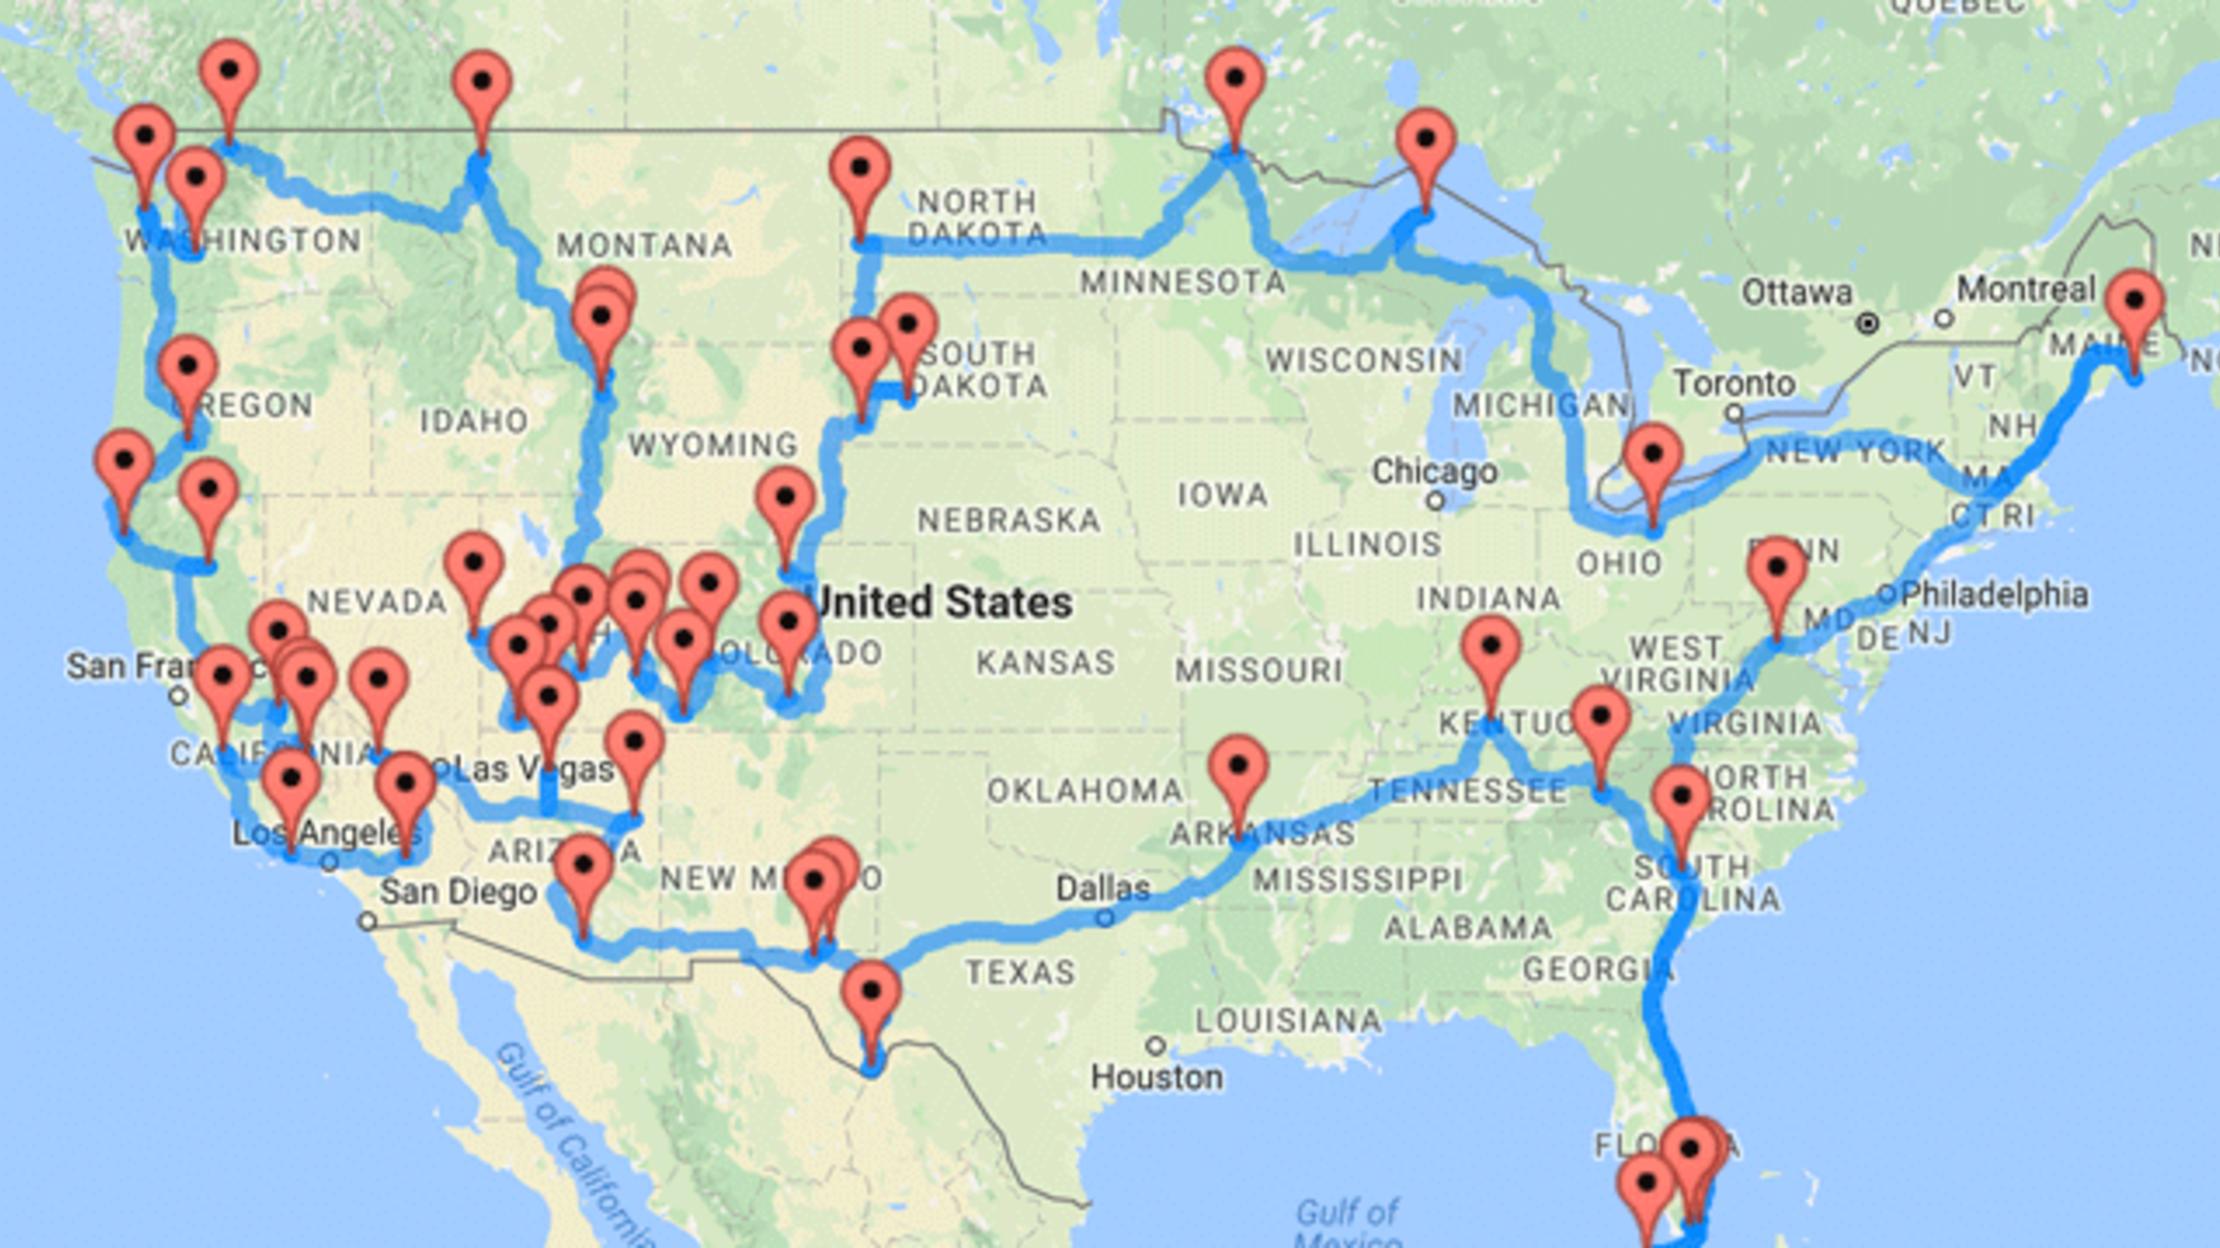 Road Trip Genius Calculates The Shortest Route Through 47 National Parks Mental Floss